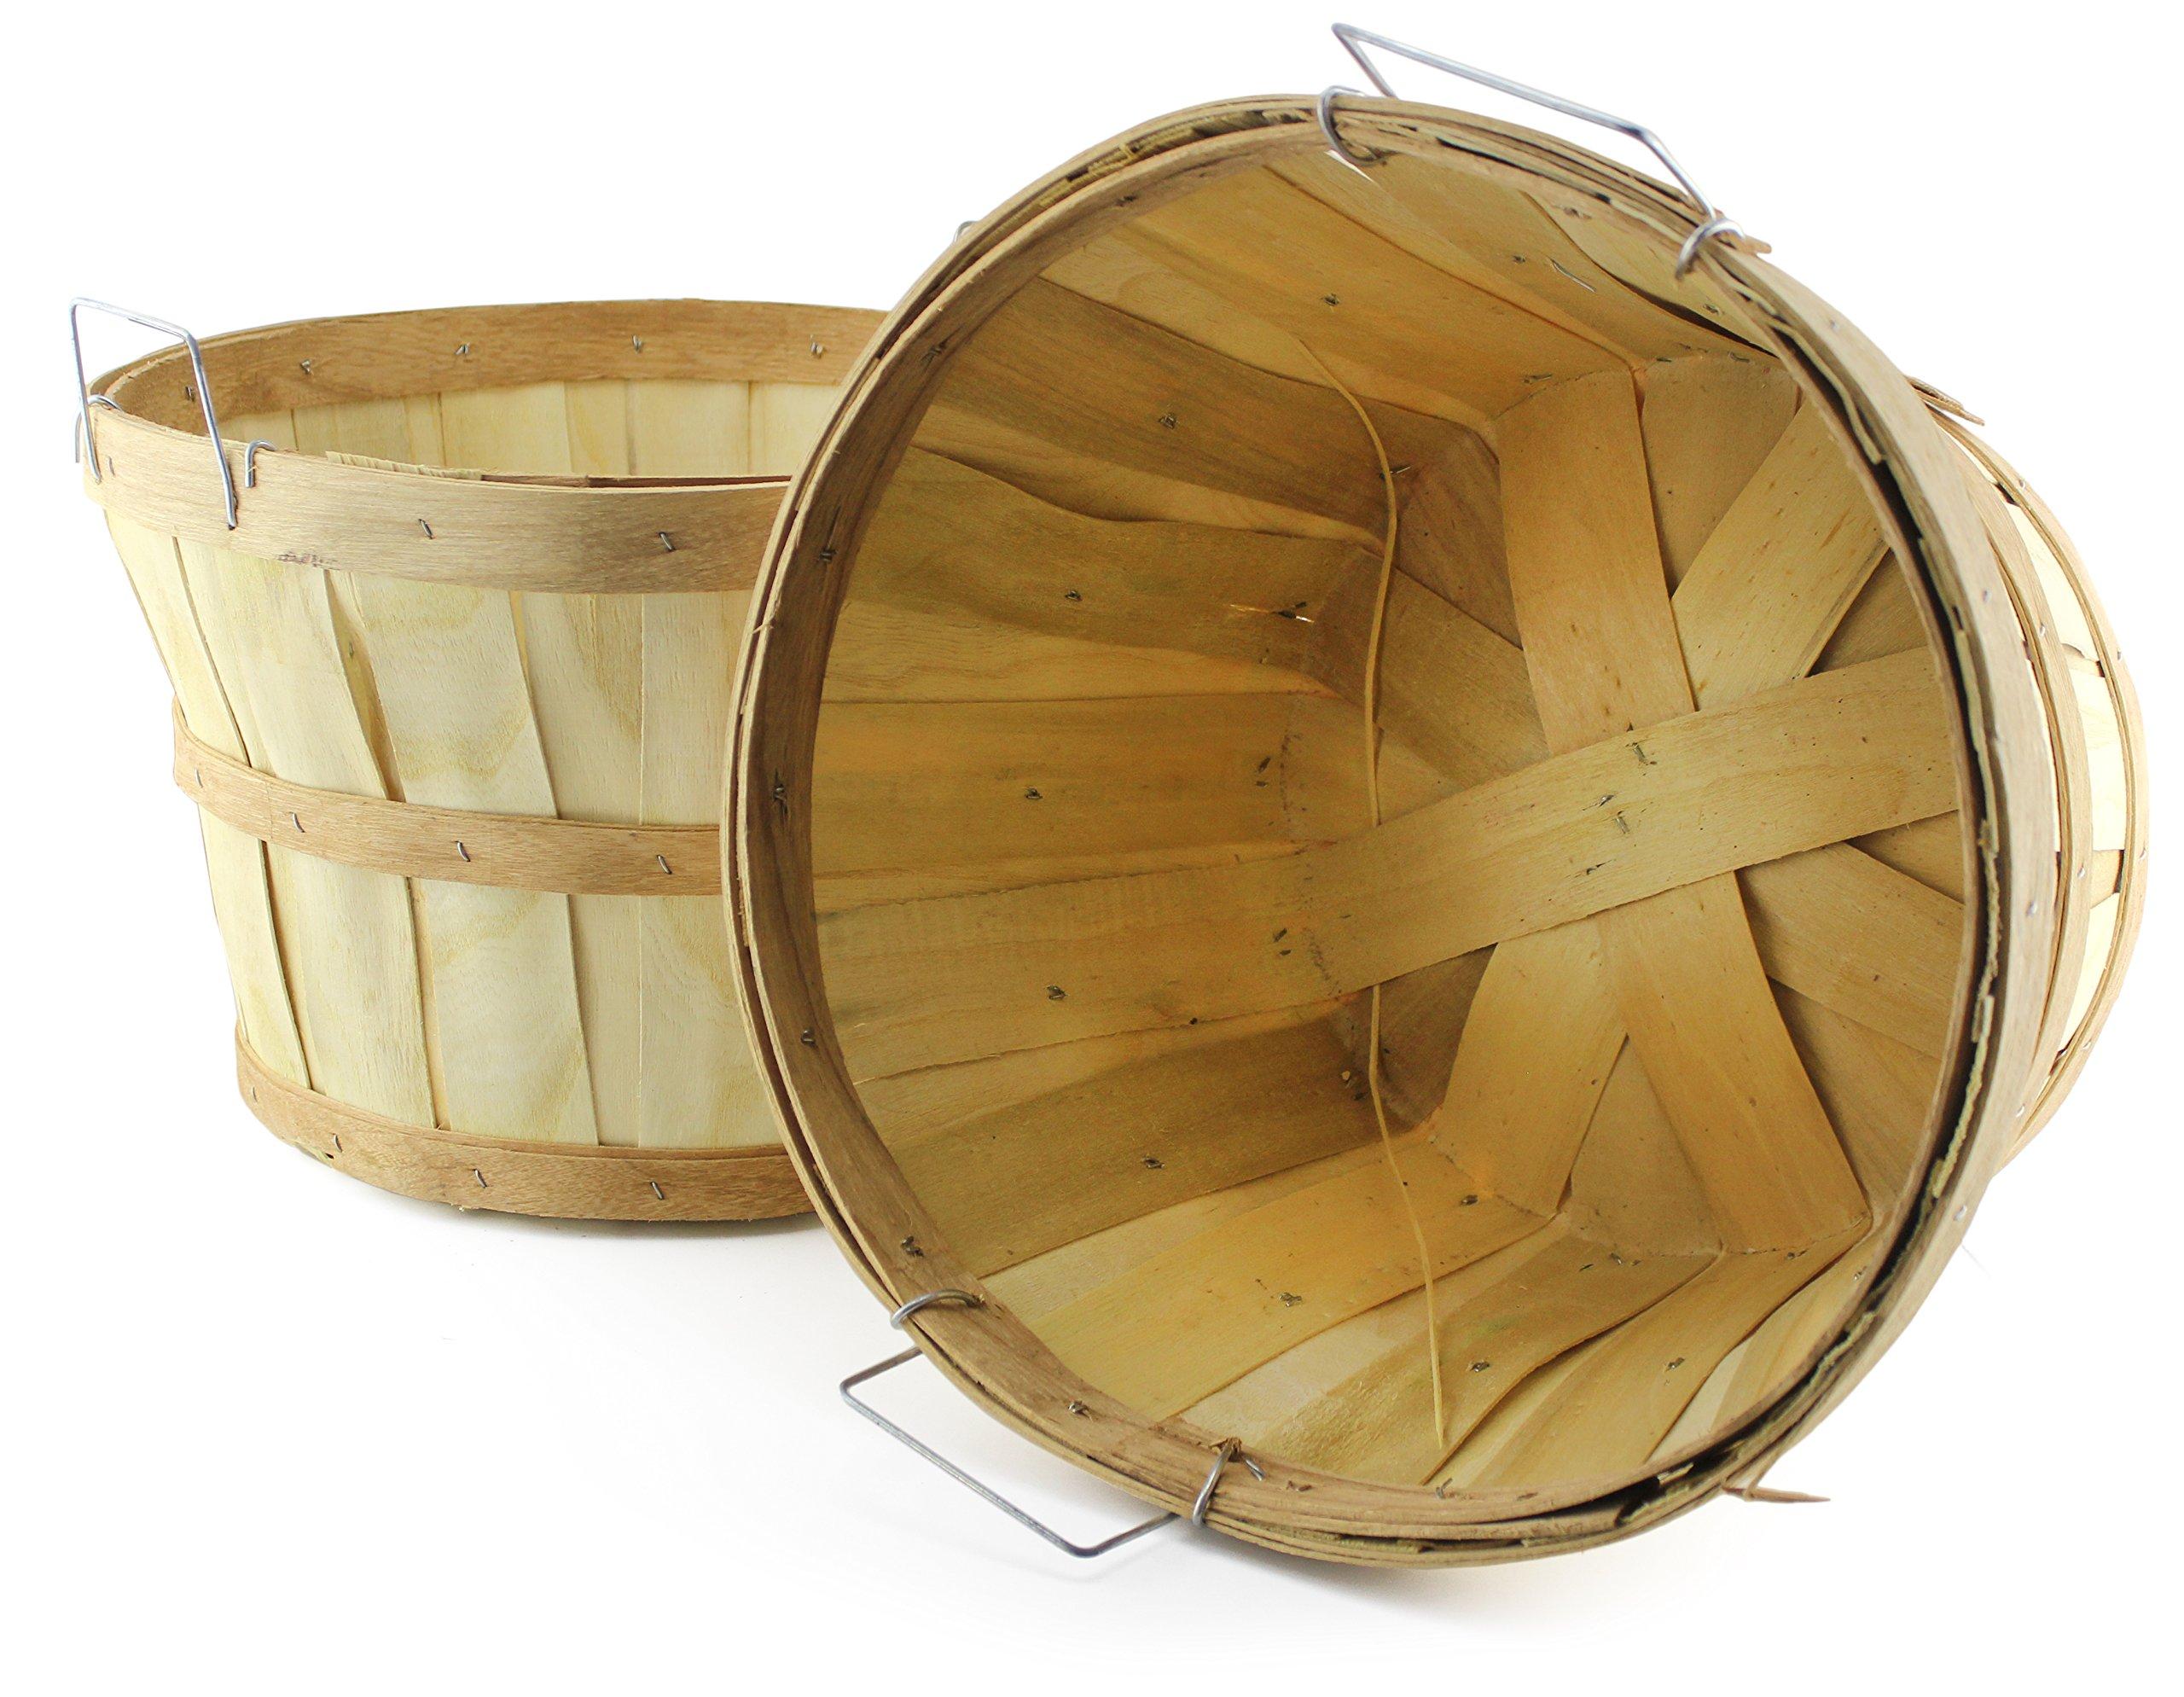 Wooden Half Bushel Baskets (2-Pack); Large Round Wood Farm Market Baskets for Decorating, Gardening, Fall Seasonal Displays (Natural, Tall)